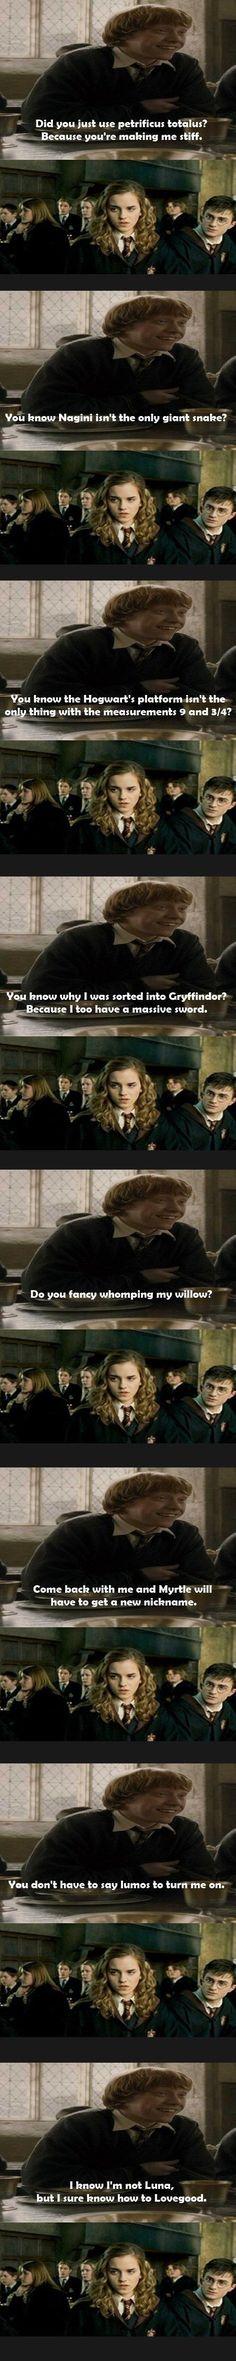 Hermione isn't impressed - Imgur